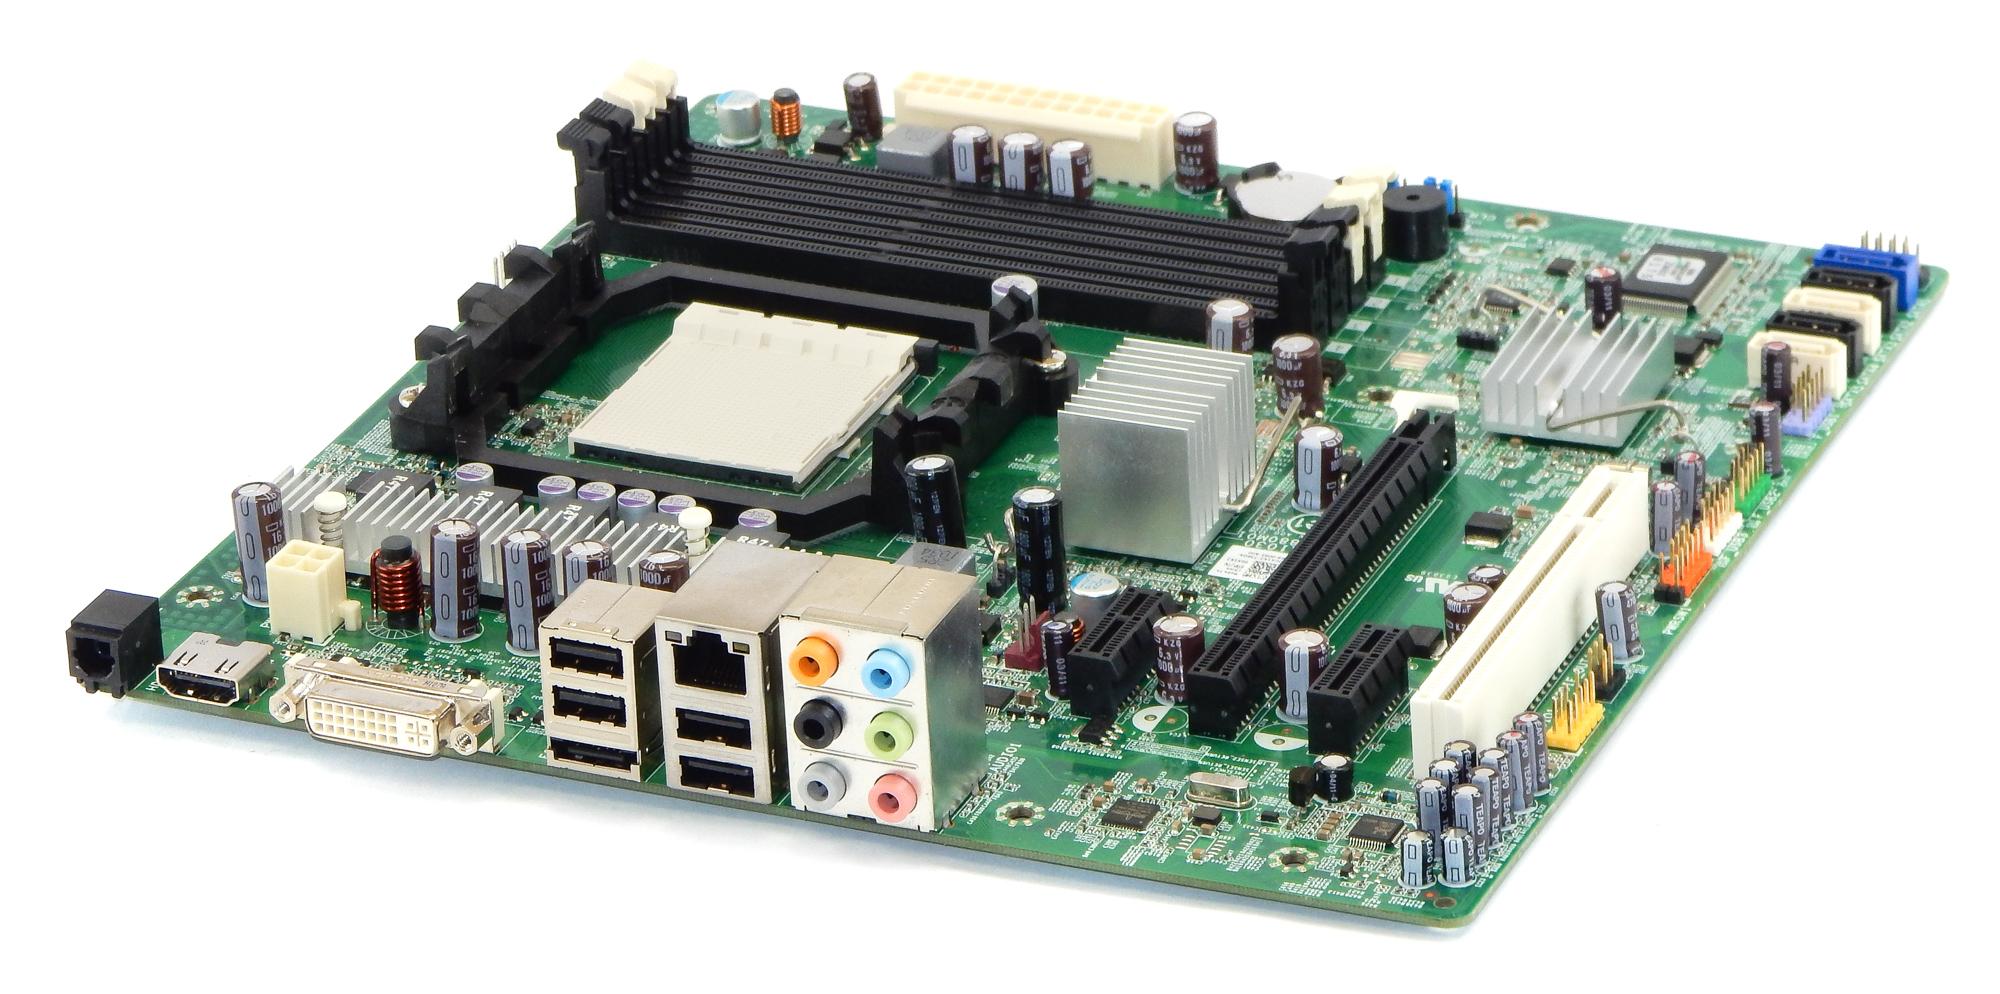 GK1K2 Dell Socket AM3 Motherboard KA1030 DRS880M01 REV:A00 f/ Studio XPS 7100